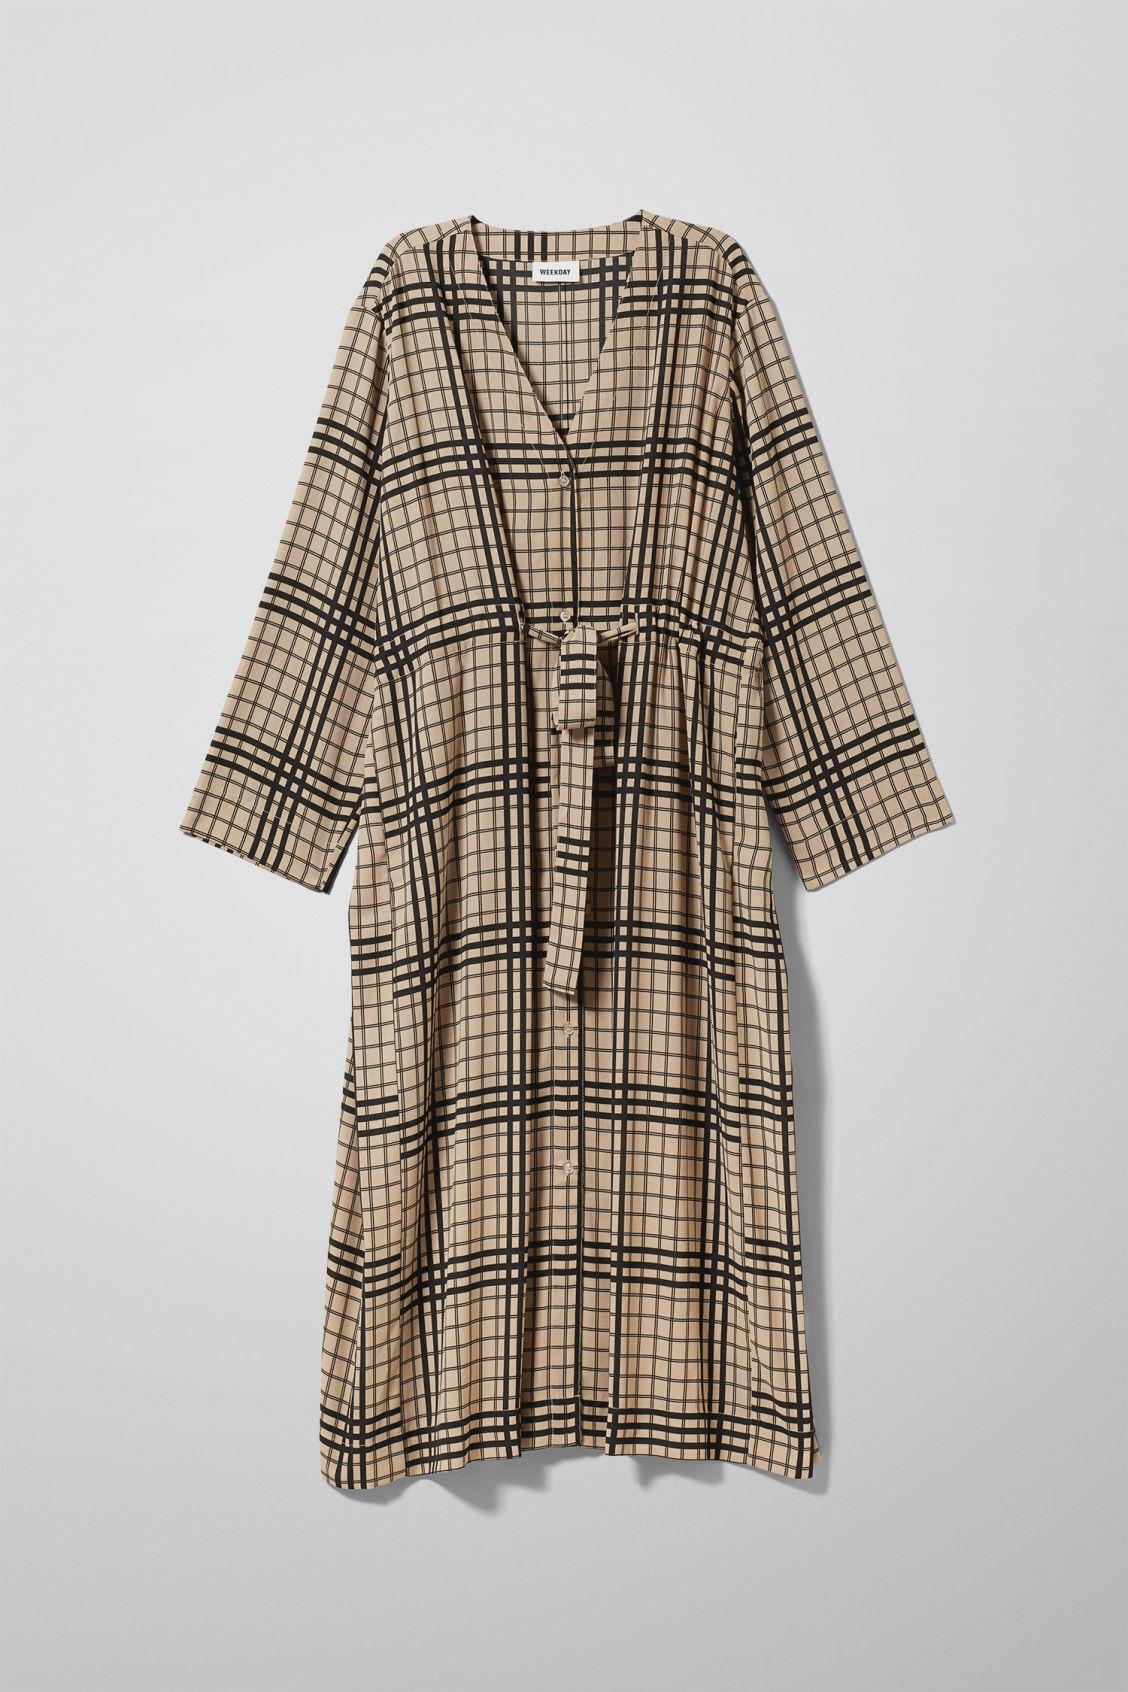 Image of Chalk Long Sleeve Dress - Beige-XS